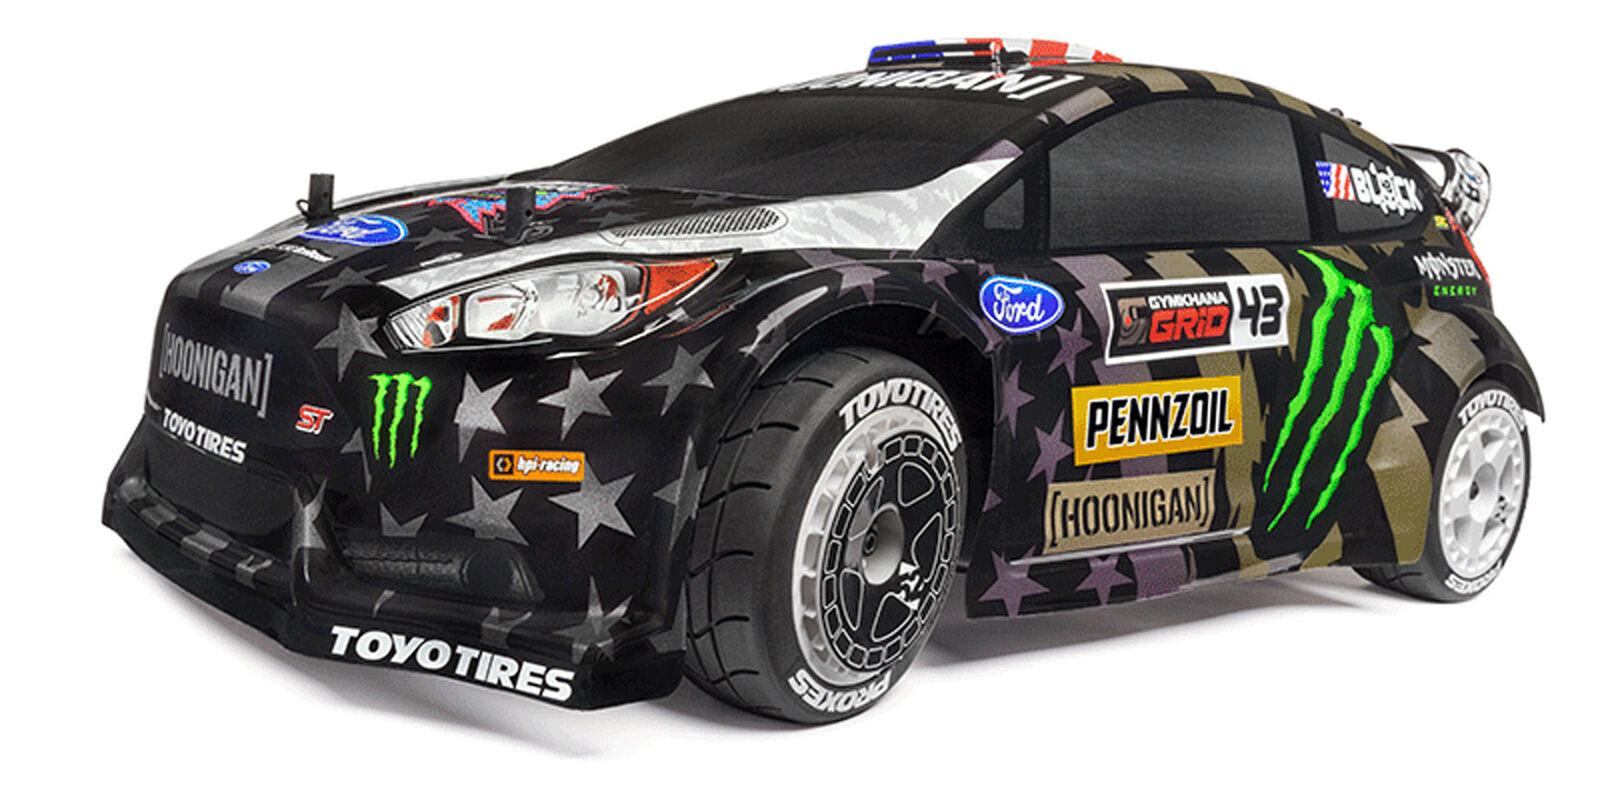 Wr8 Nitro Ken Block Gymkhana Ford Fiesta St Rx43 Rtr 1 8 4wd Rally Car Hpi120037 For Sale Online Ebay